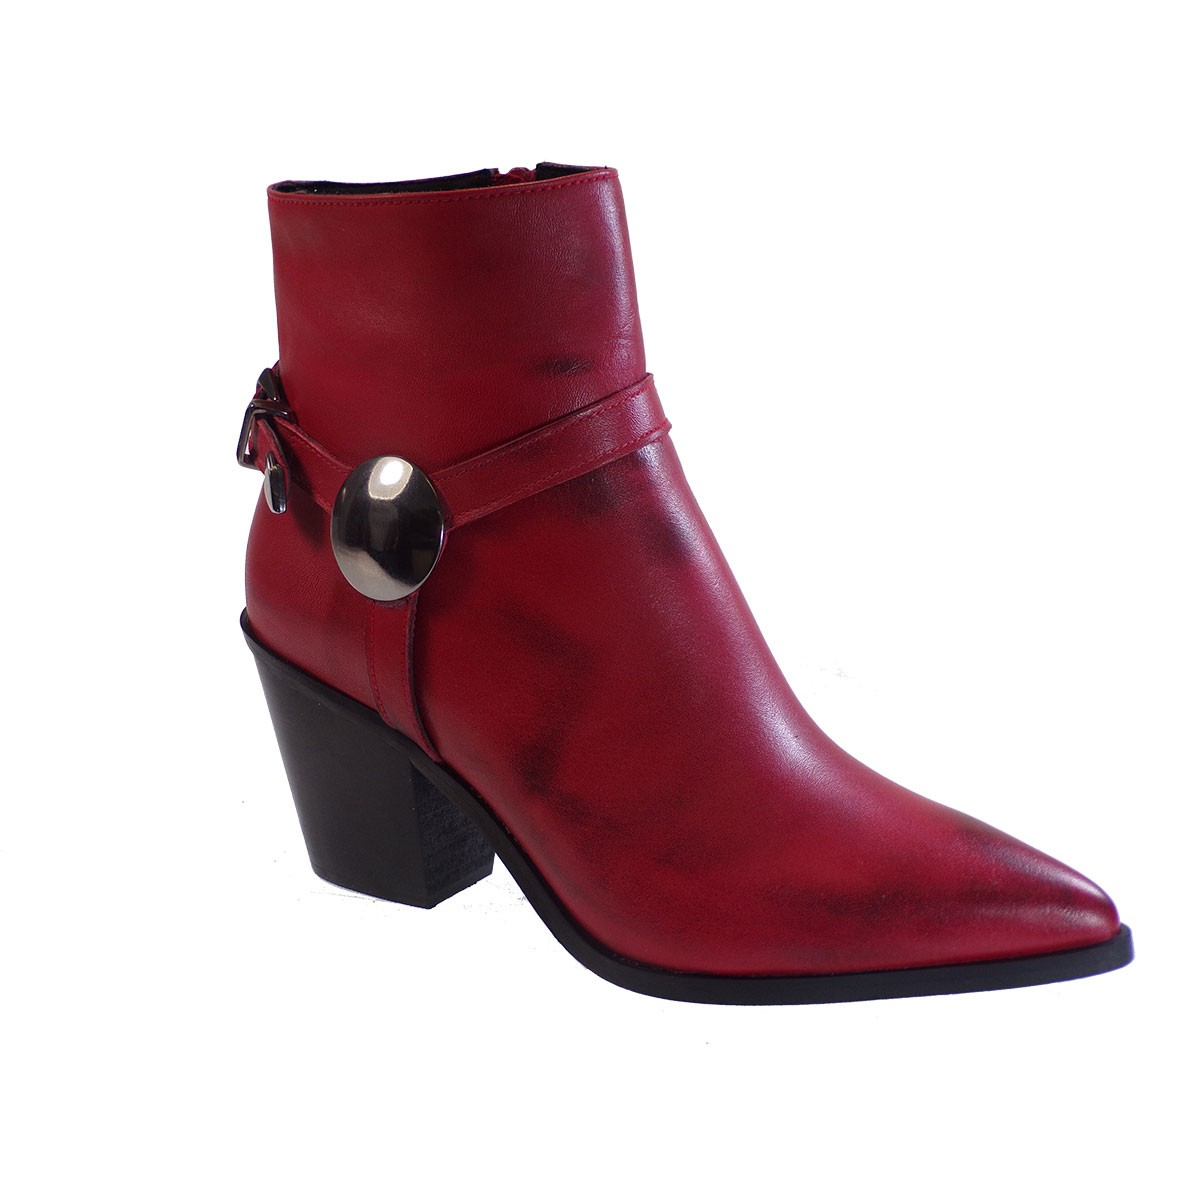 Fardoulis Shoes Γυναικεία Παπούτσια Μποτάκια K217 Κόκκινο Δέρμα